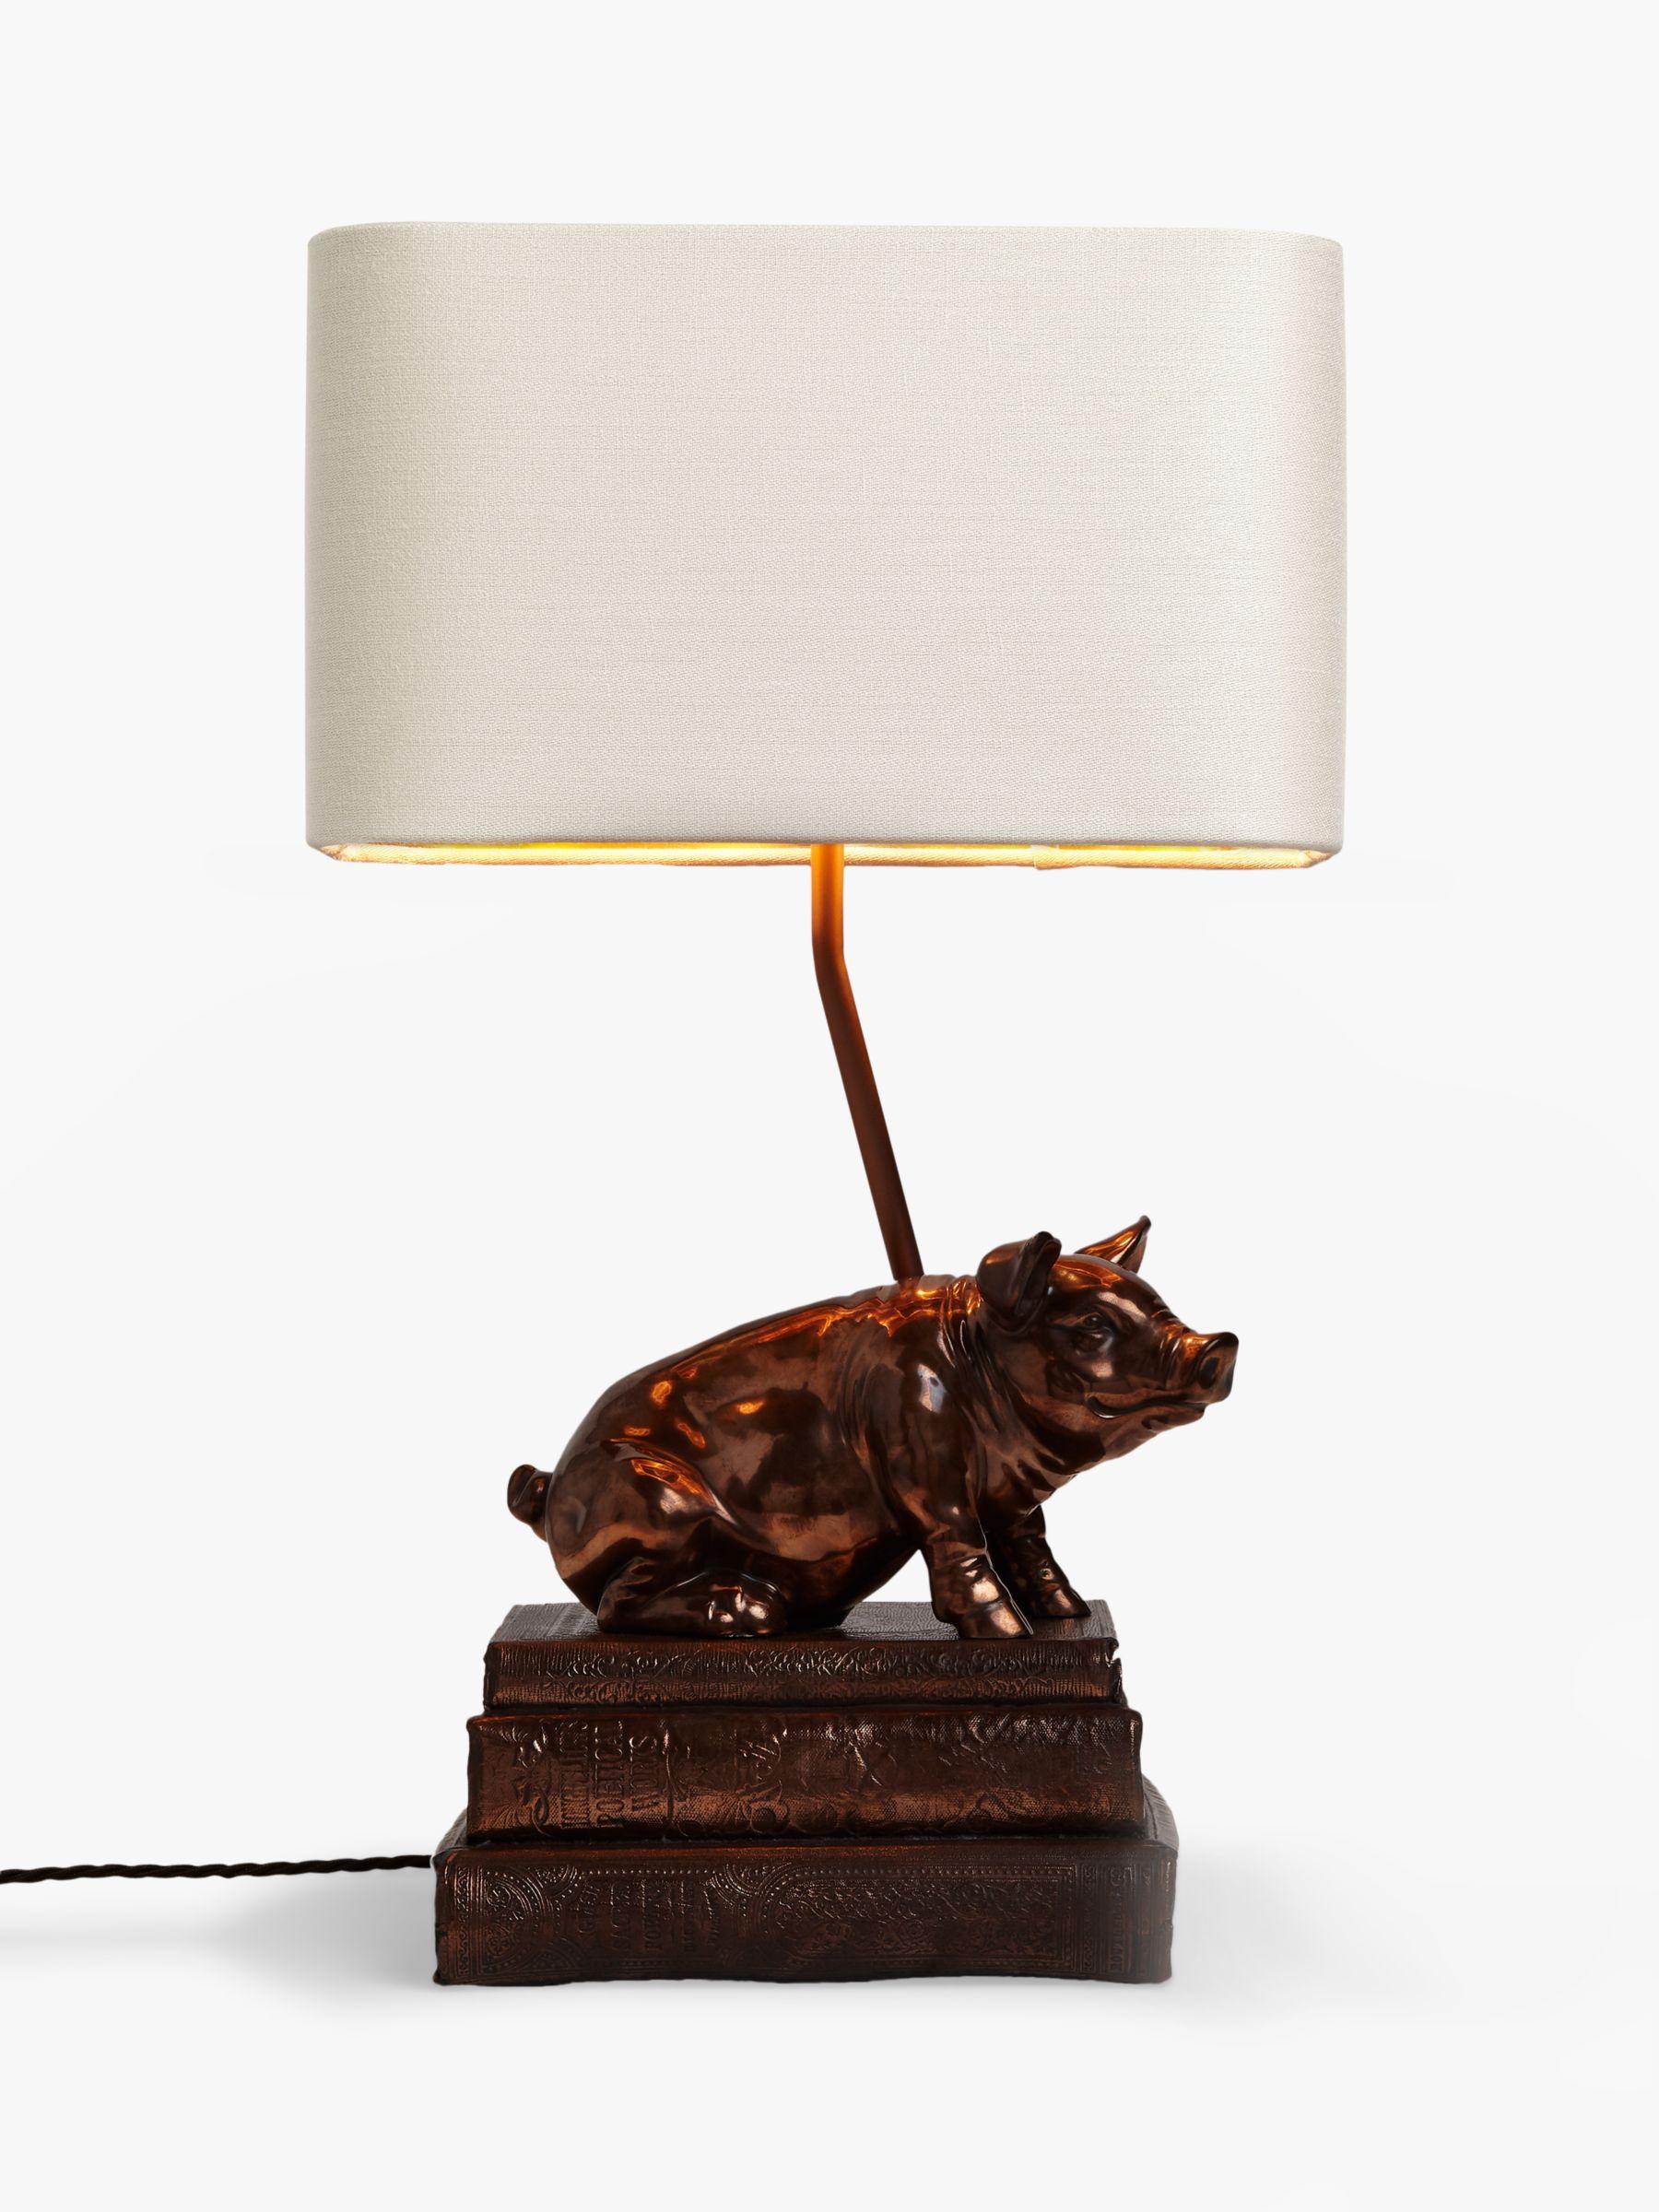 David Hunt David Hunt Frank the Pig Table Lamp, Copper